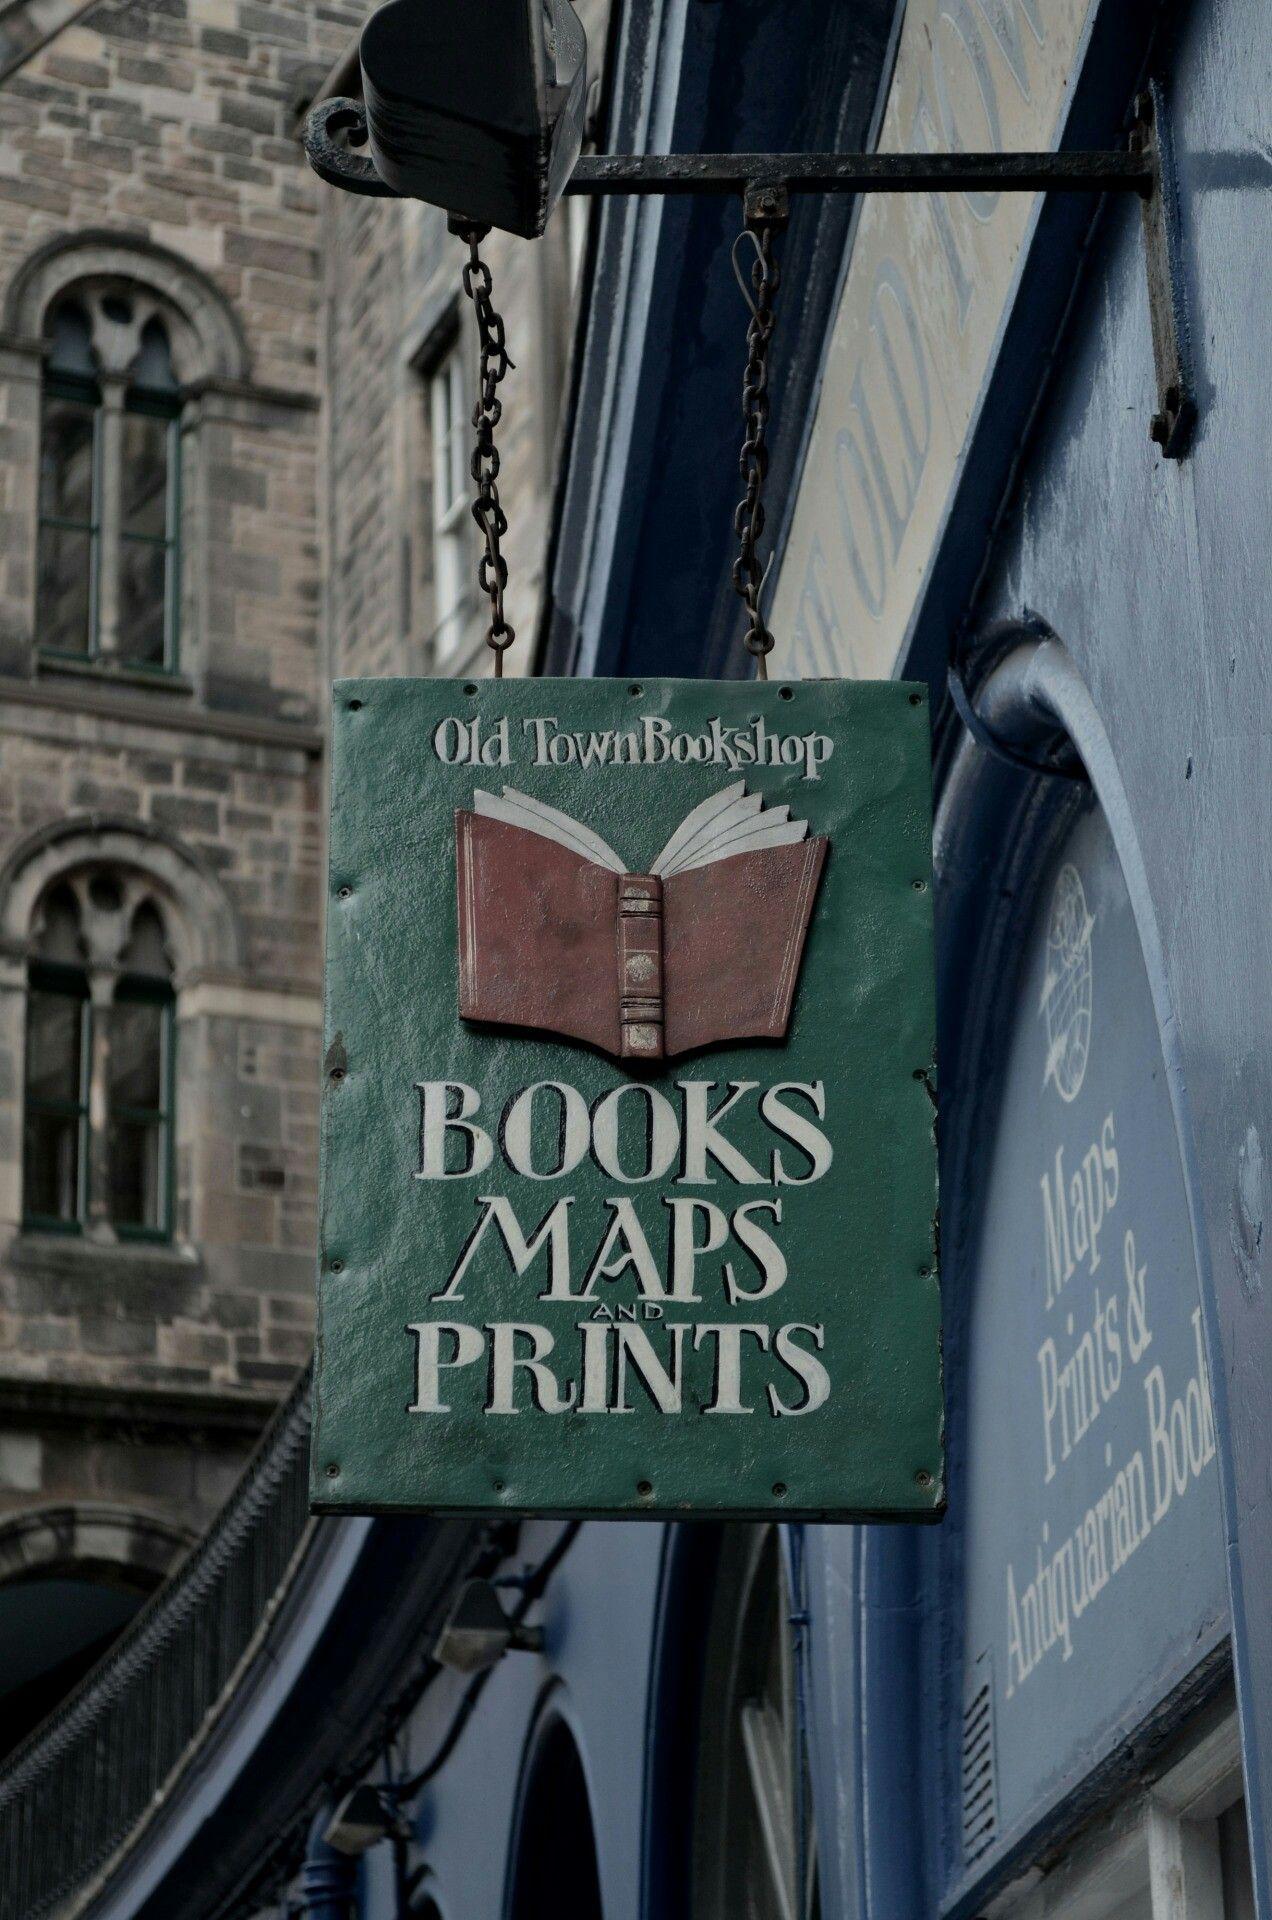 Old Town Bookshop Edinburgh Bookshop Bookstore Books